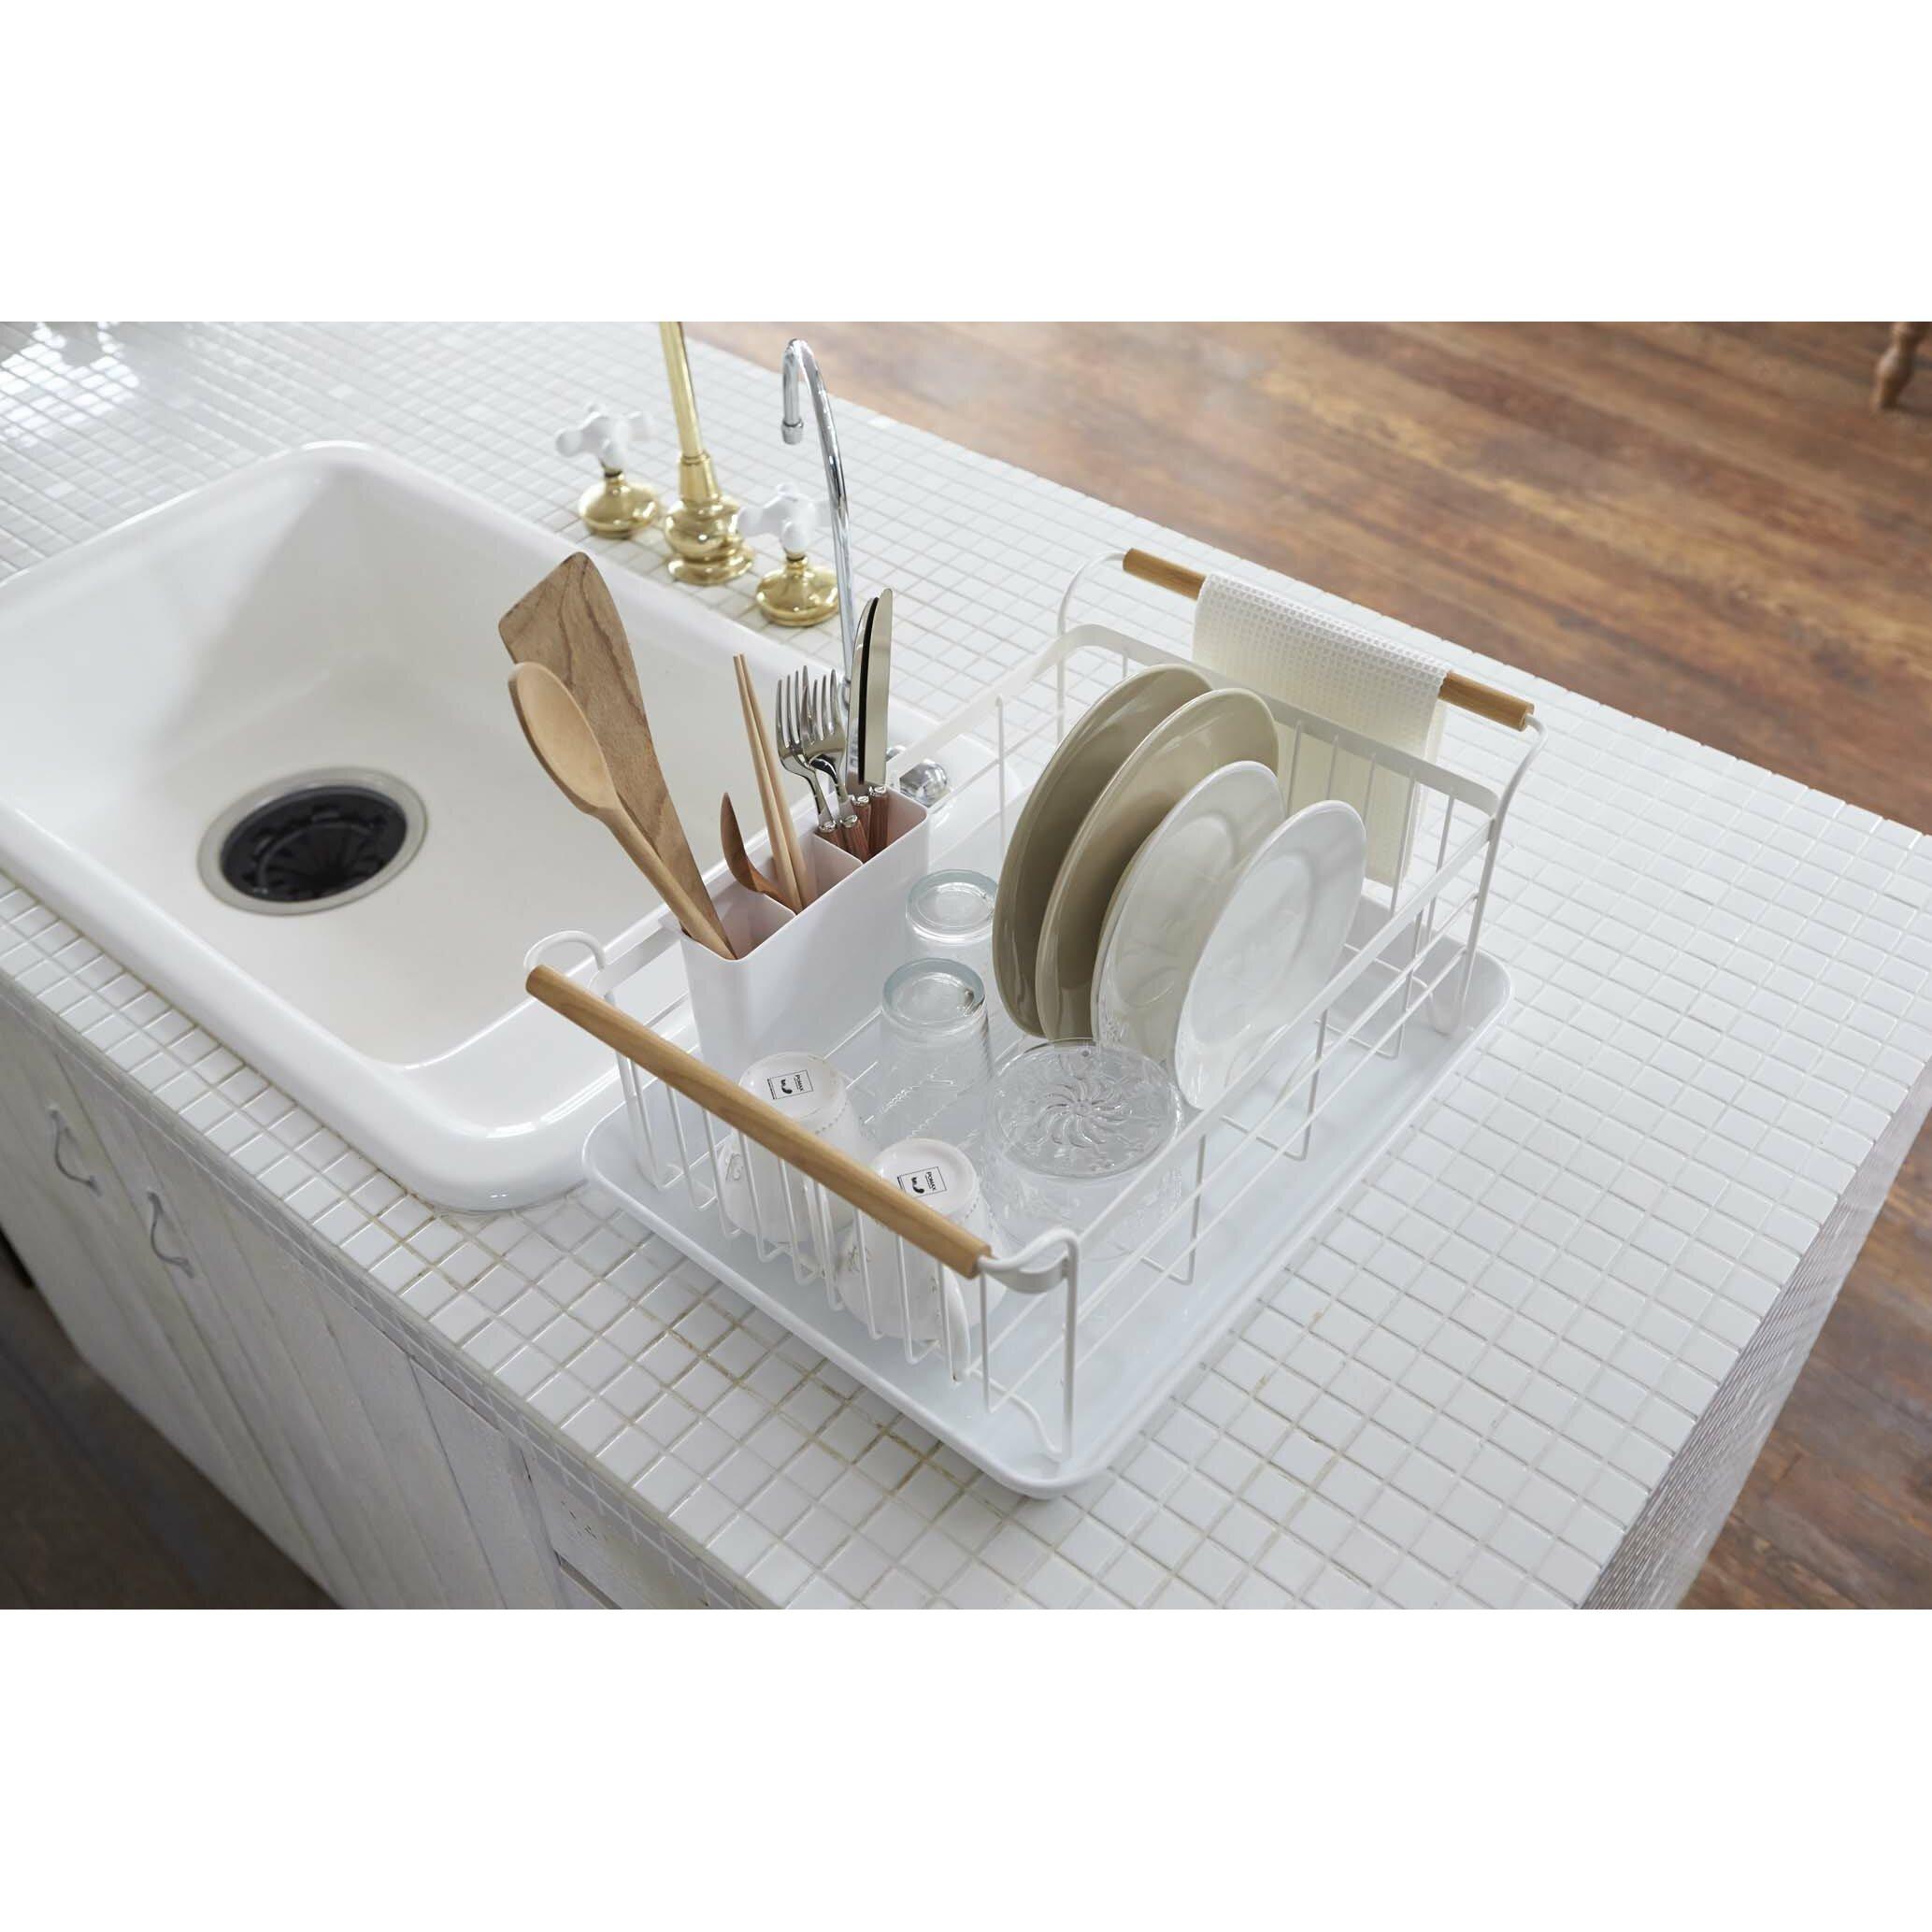 Drain Racks For Kitchen Sinks Yamazaki Usa Tosca Dish Drainer Rack Reviews Wayfair